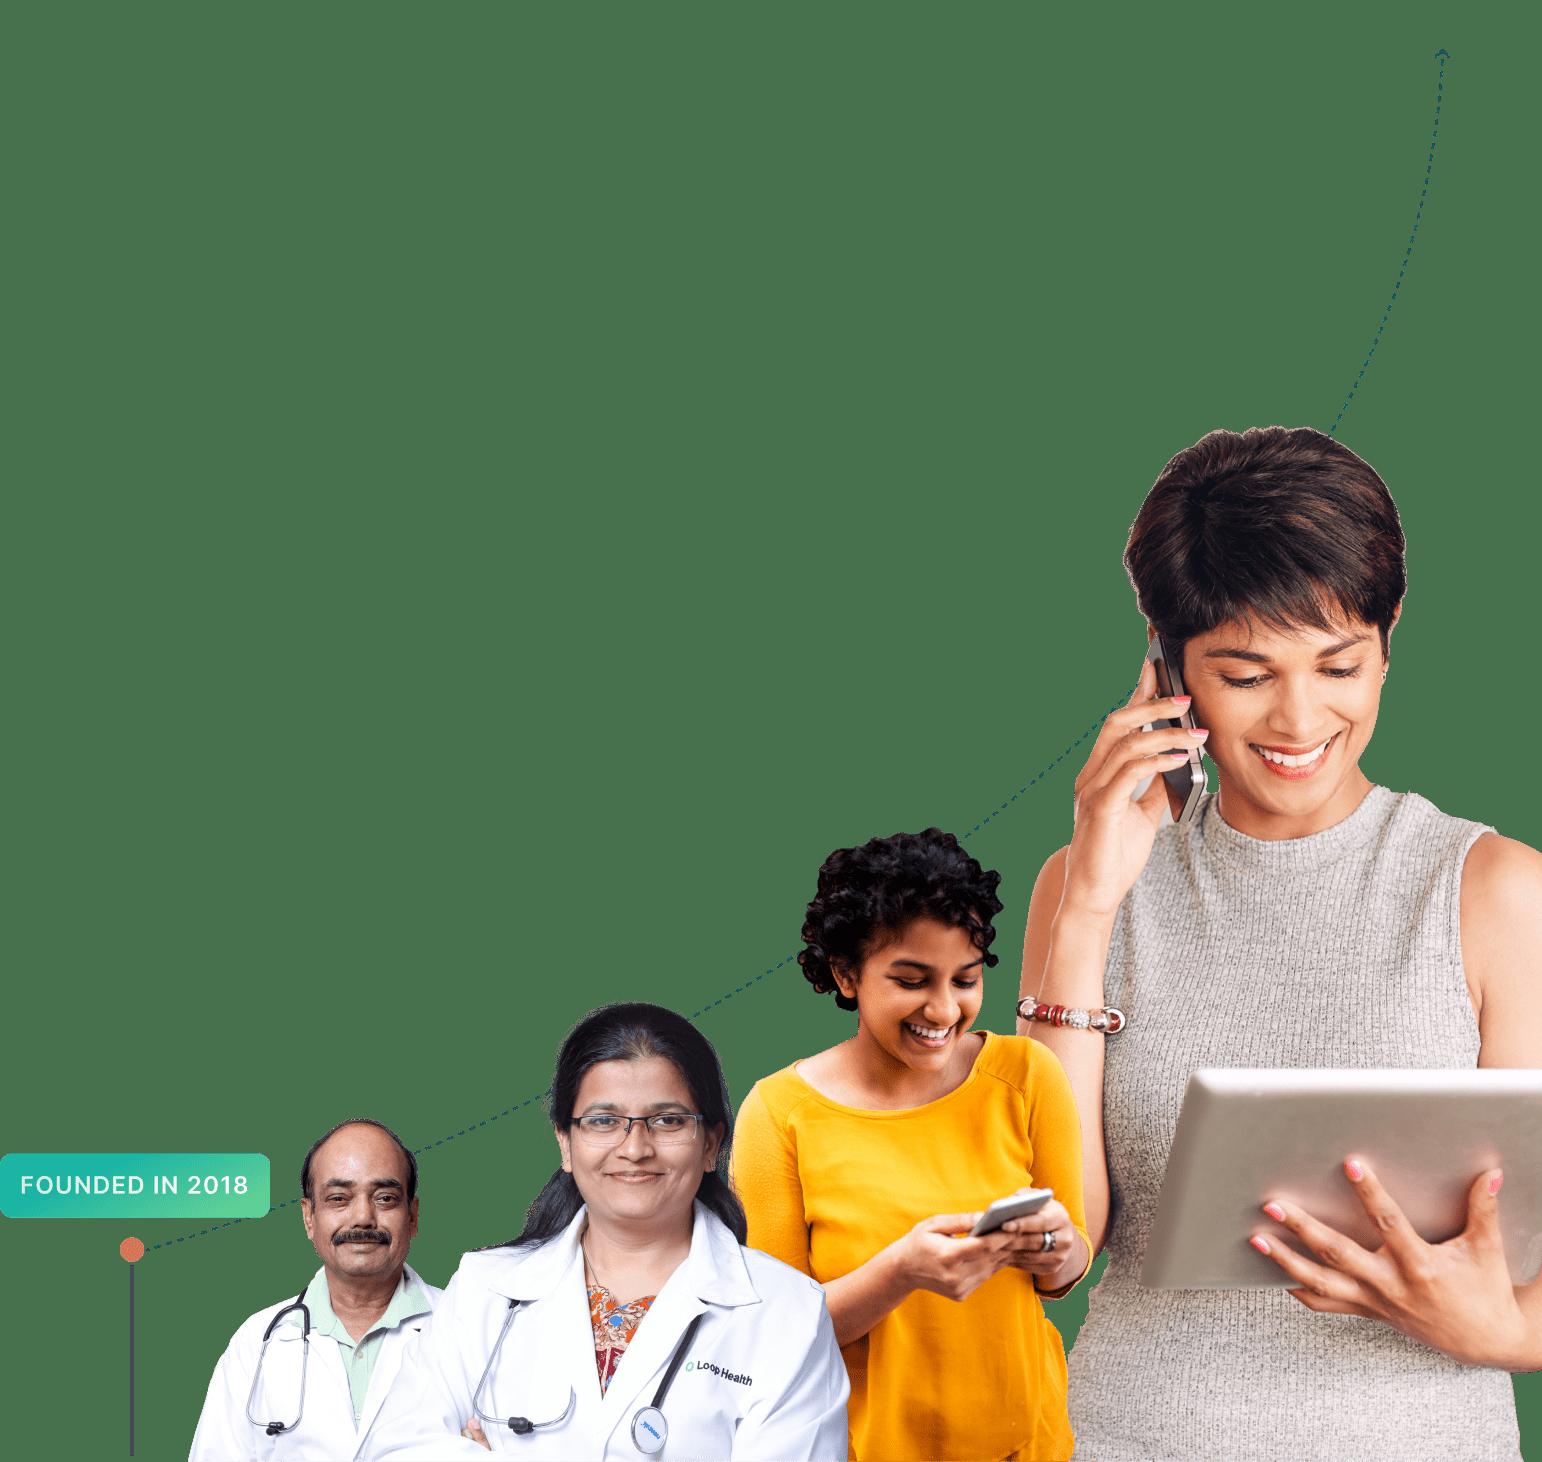 Revolutionizing group health insurance